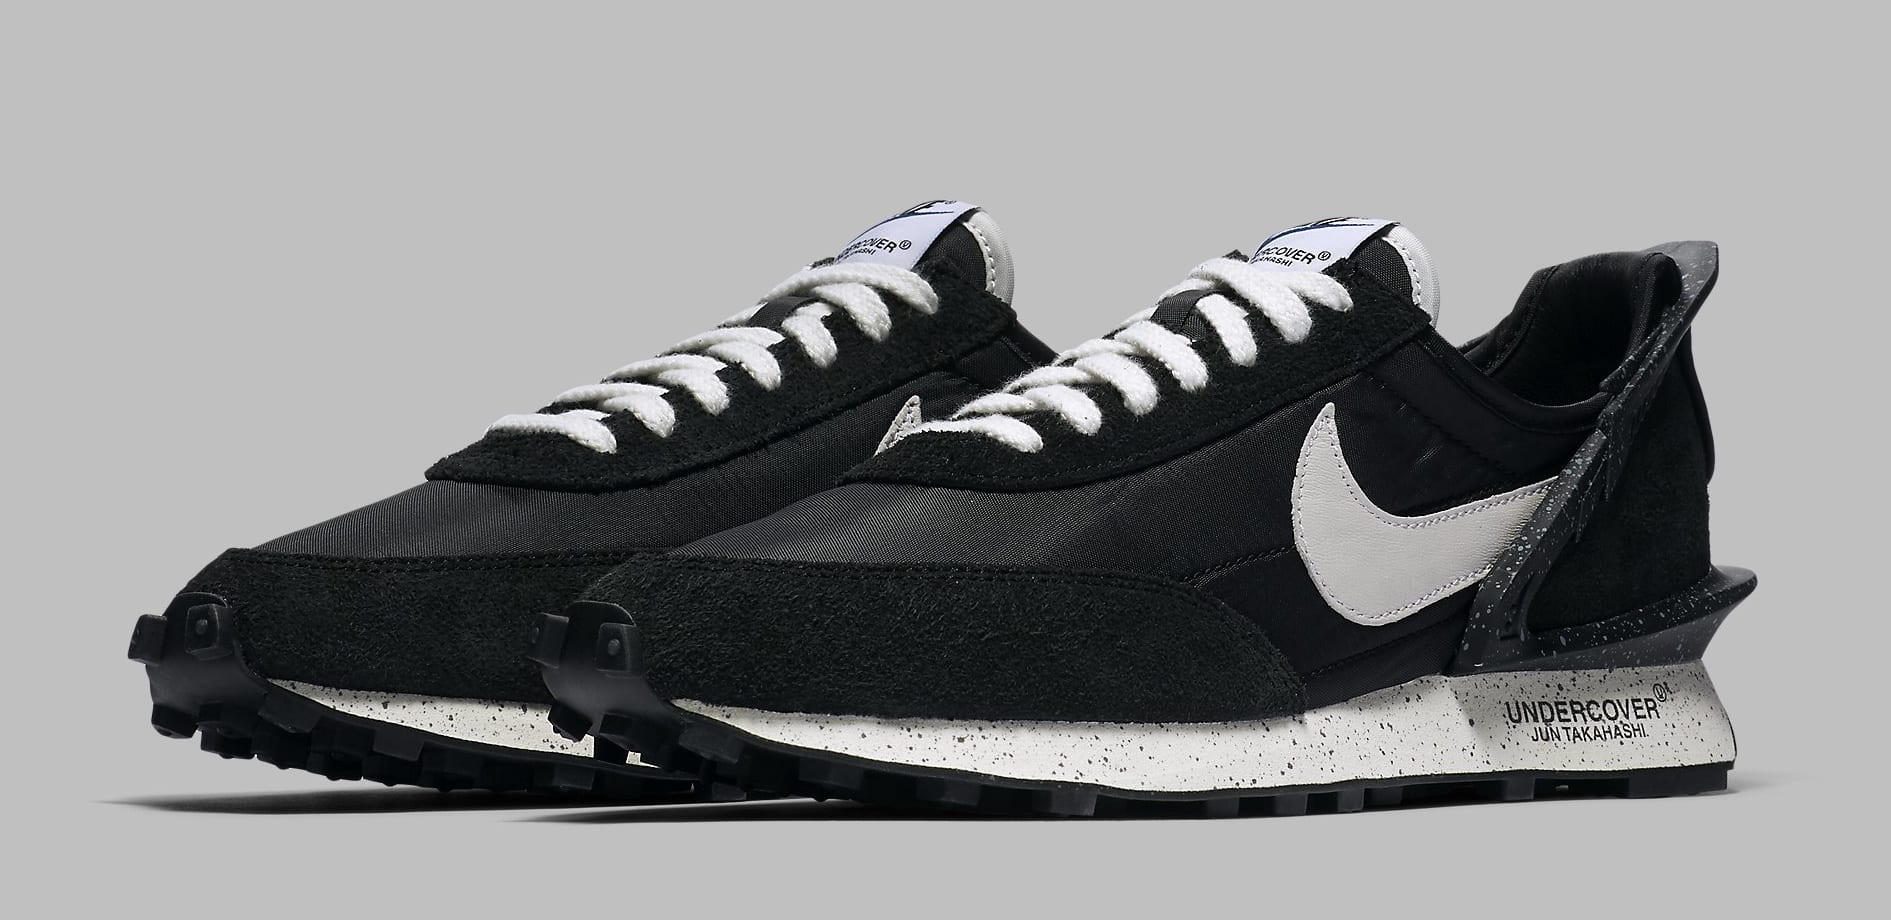 Undercover x Nike Daybreak 'Black' BV4594-001 Pair